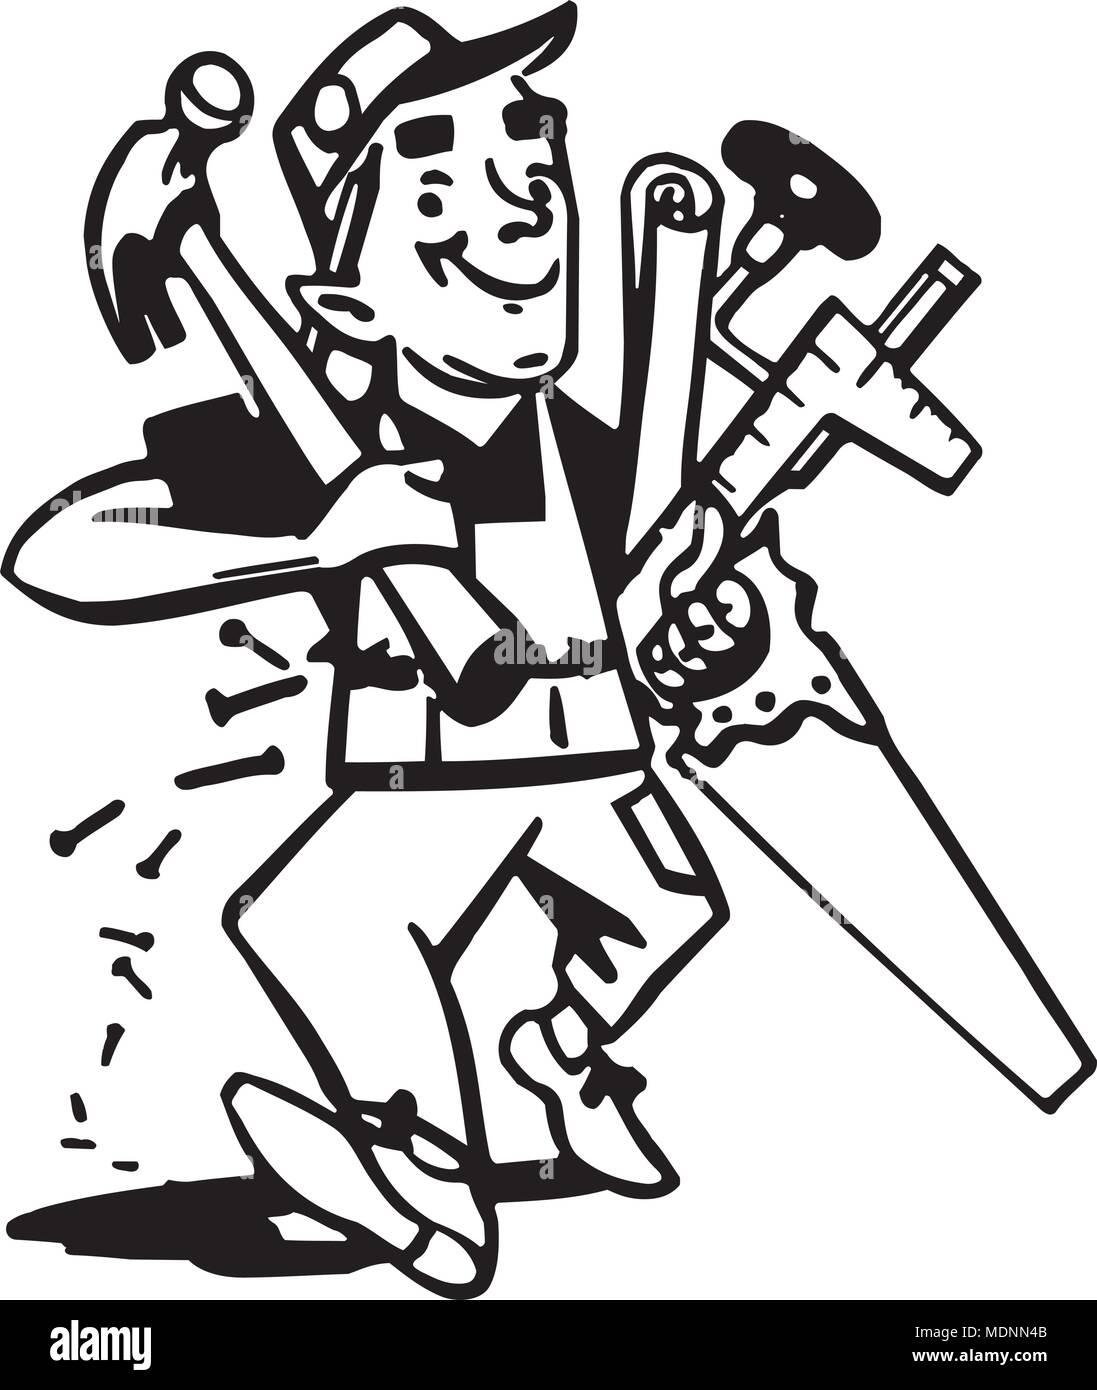 Carpenter With Tools - Retro Clipart Illustration Stock Vector